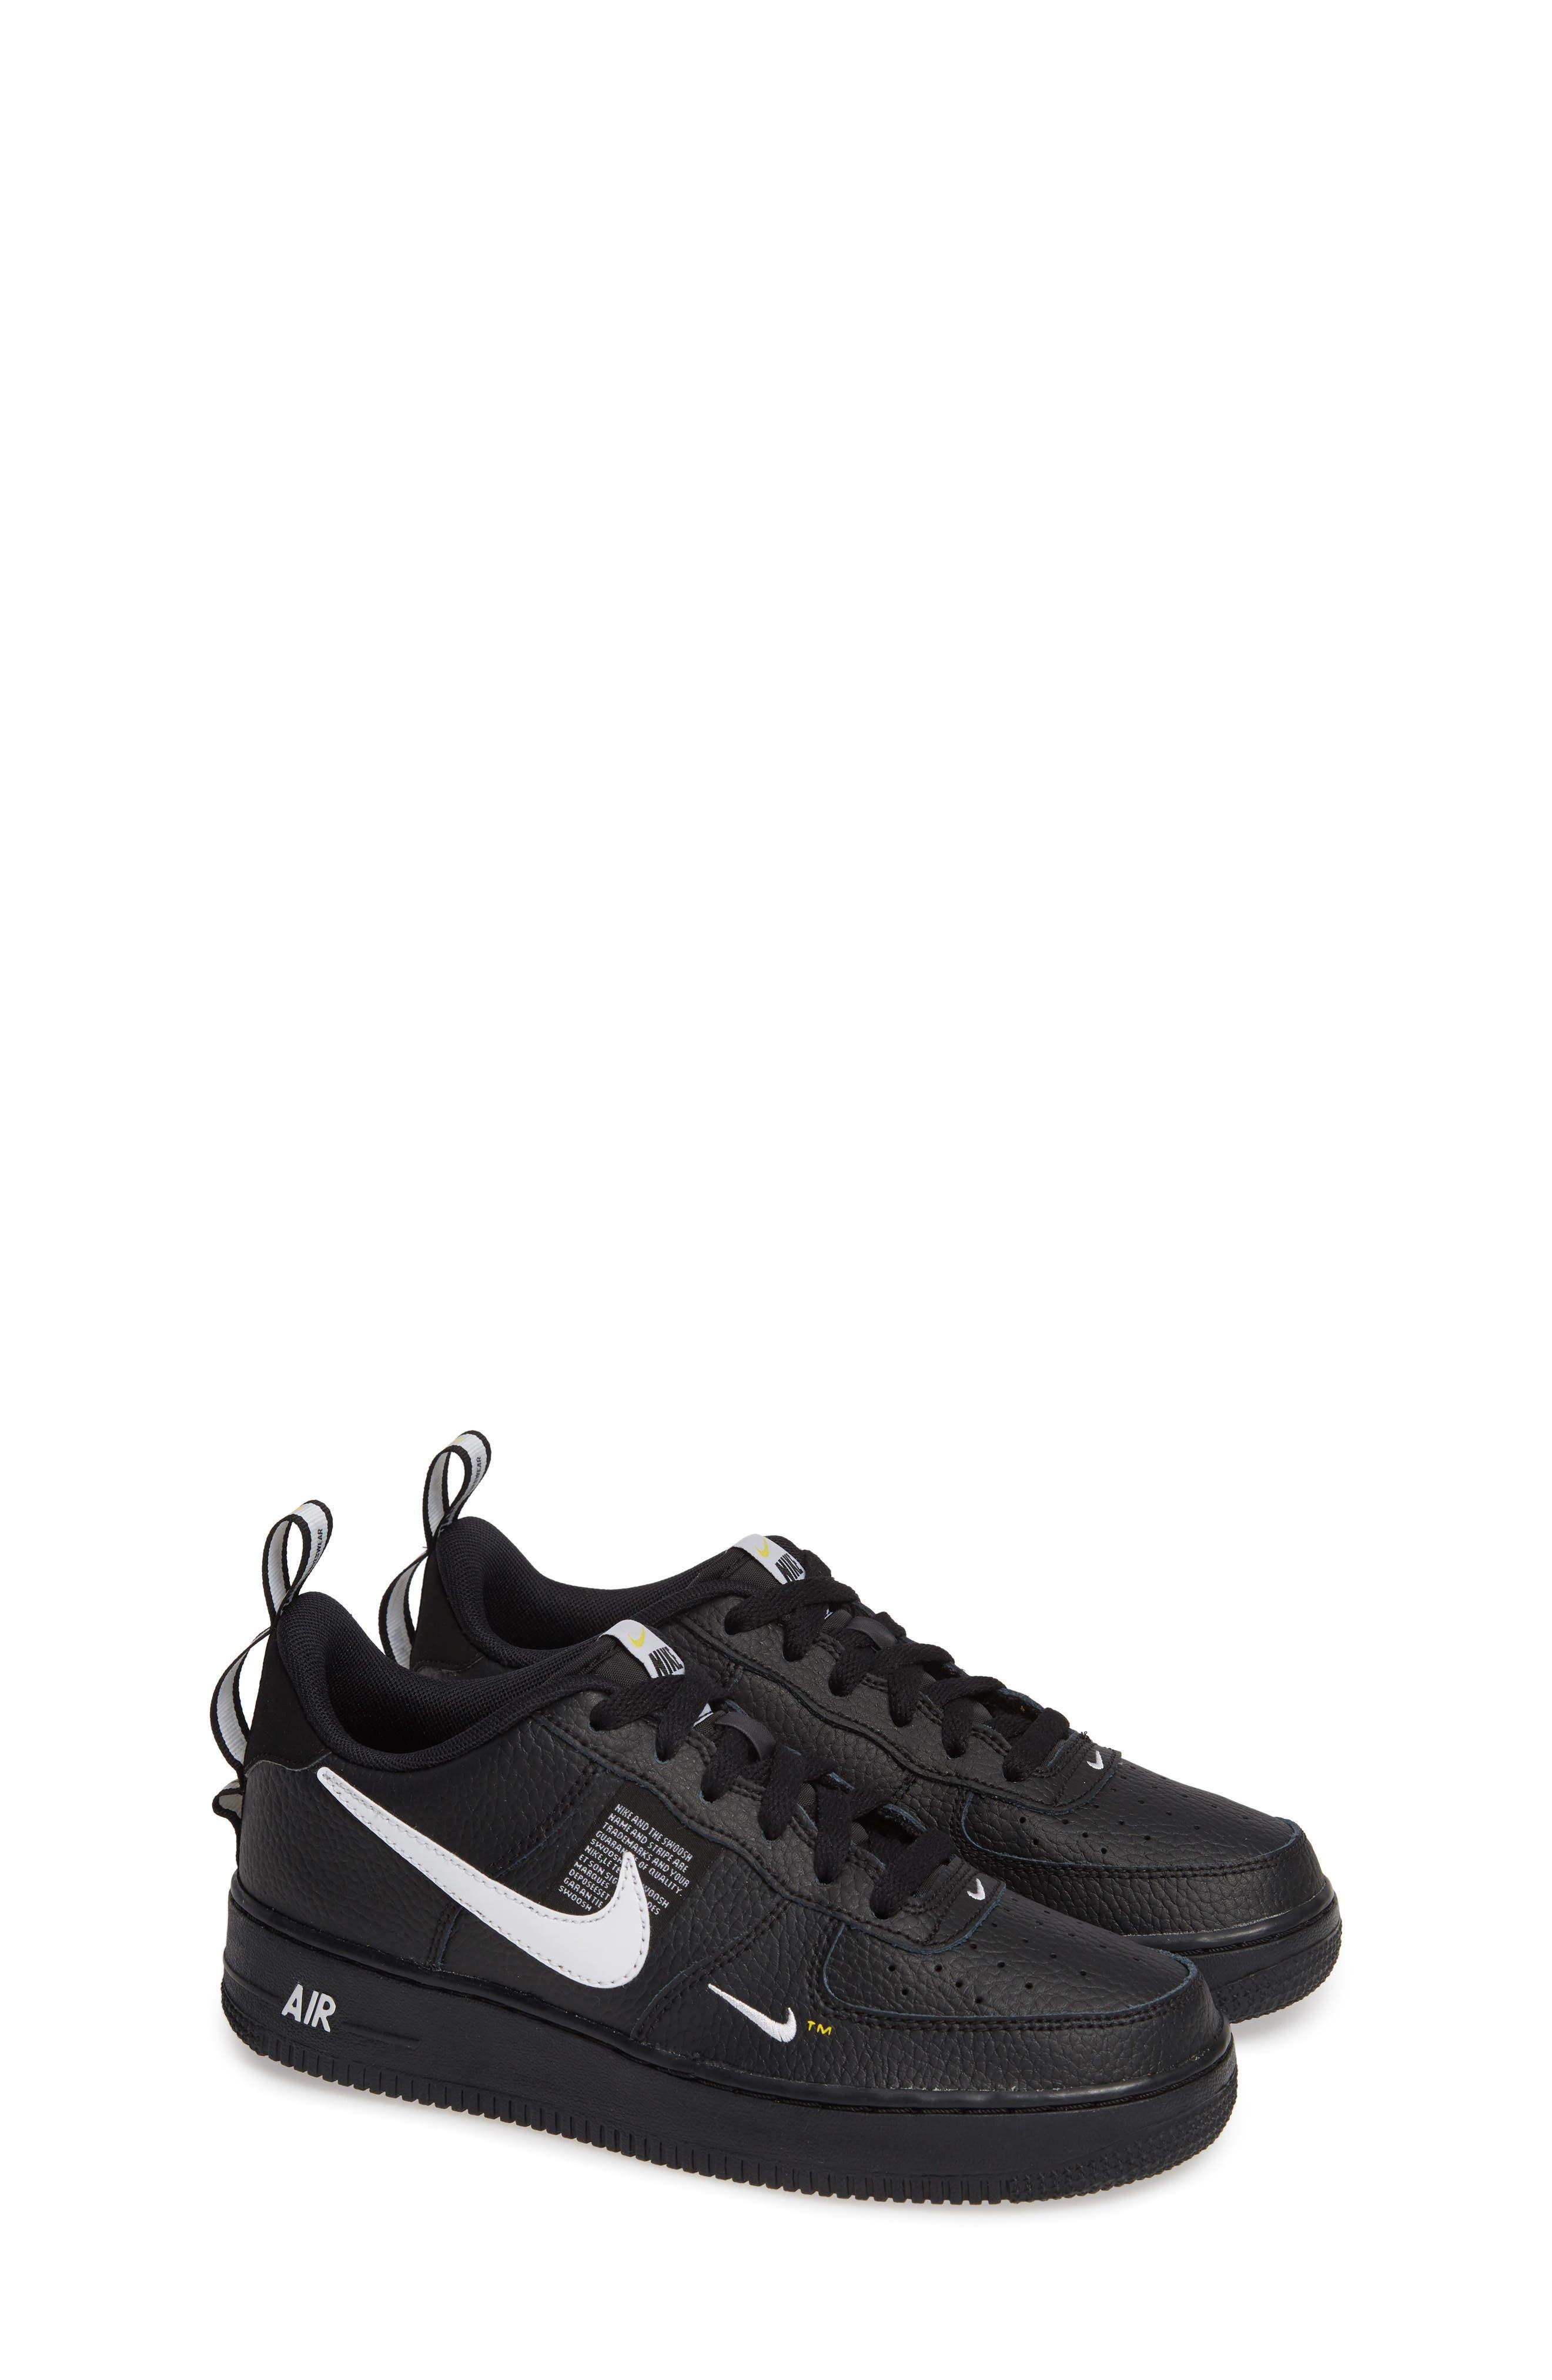 NIKE,                             Air Force 1 LV8 Sneaker,                             Alternate thumbnail 2, color,                             BLACK/ WHITE-BLACK-TOUR YELLOW